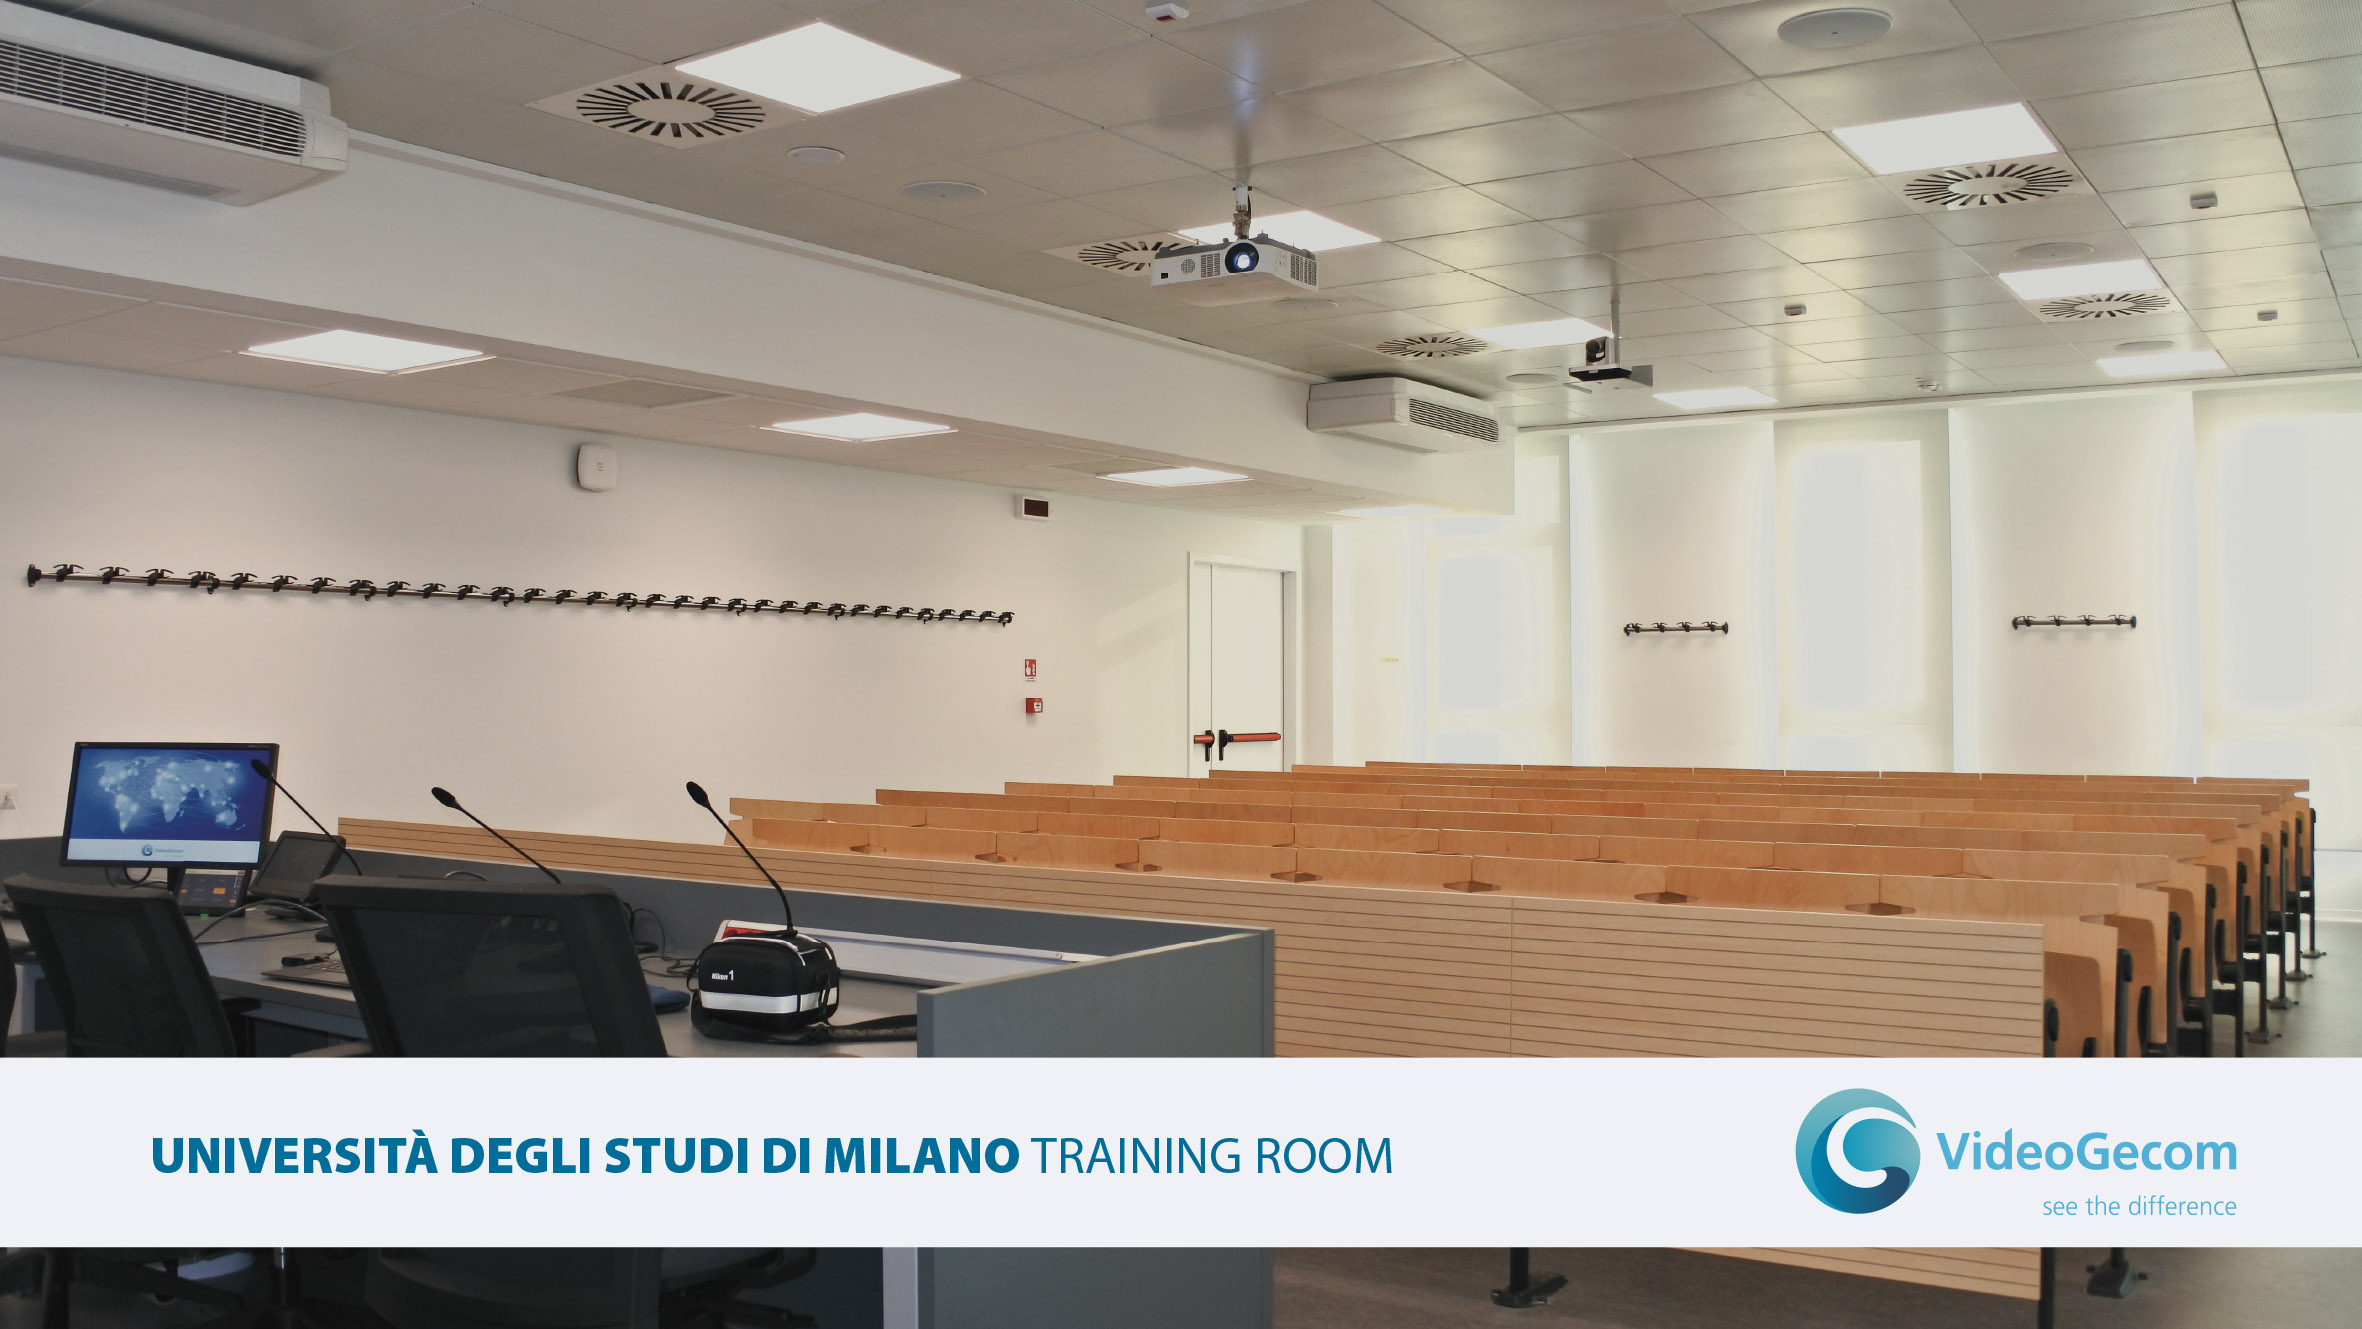 VideoGecom - soluzioni - Training Room